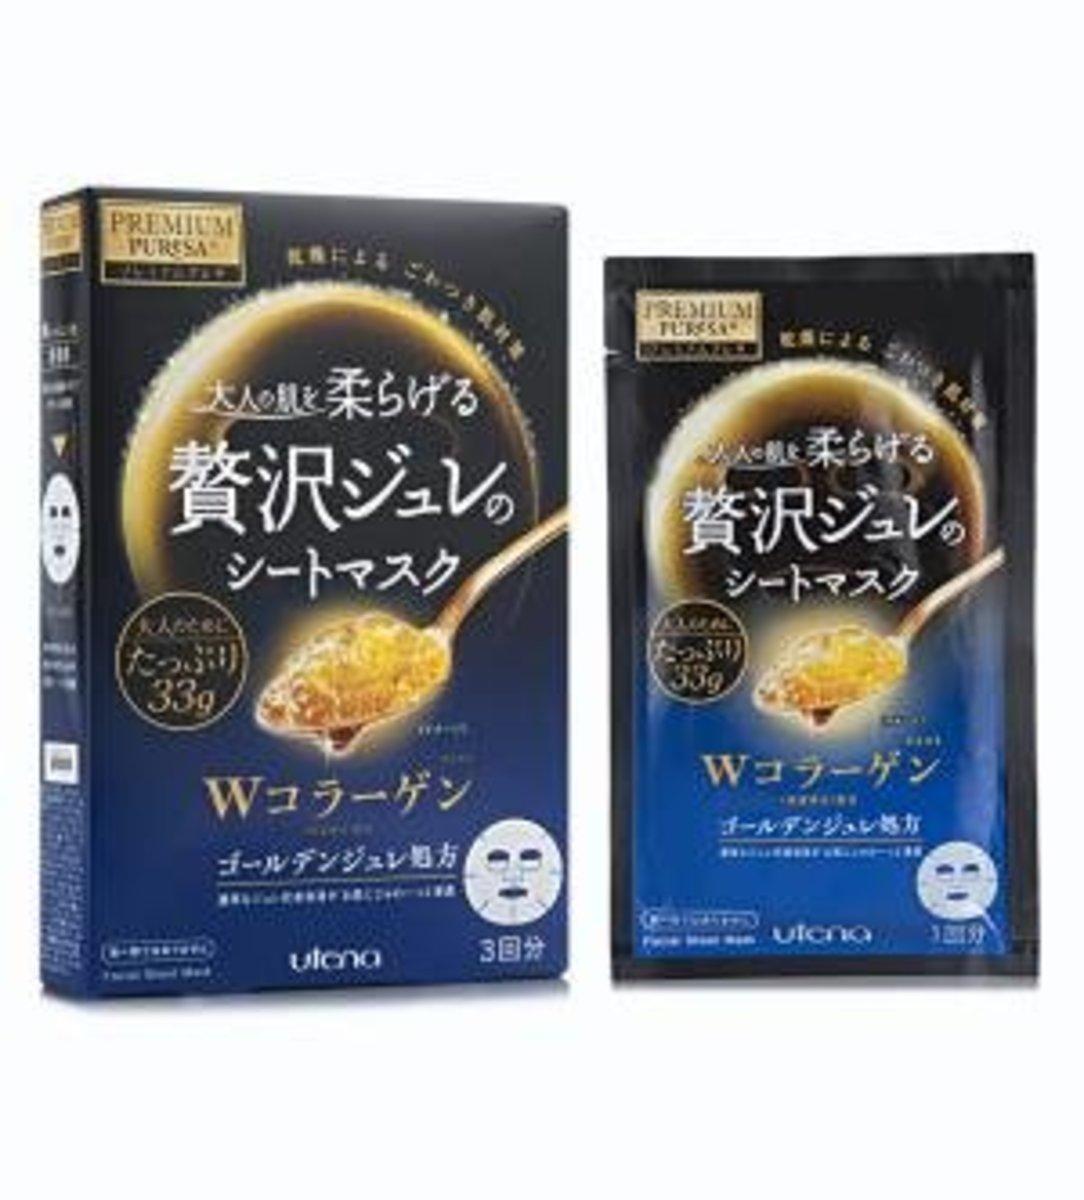 Premium Puresa Golden Gel Mask (Collagen) (3piece)(Parallel Import)